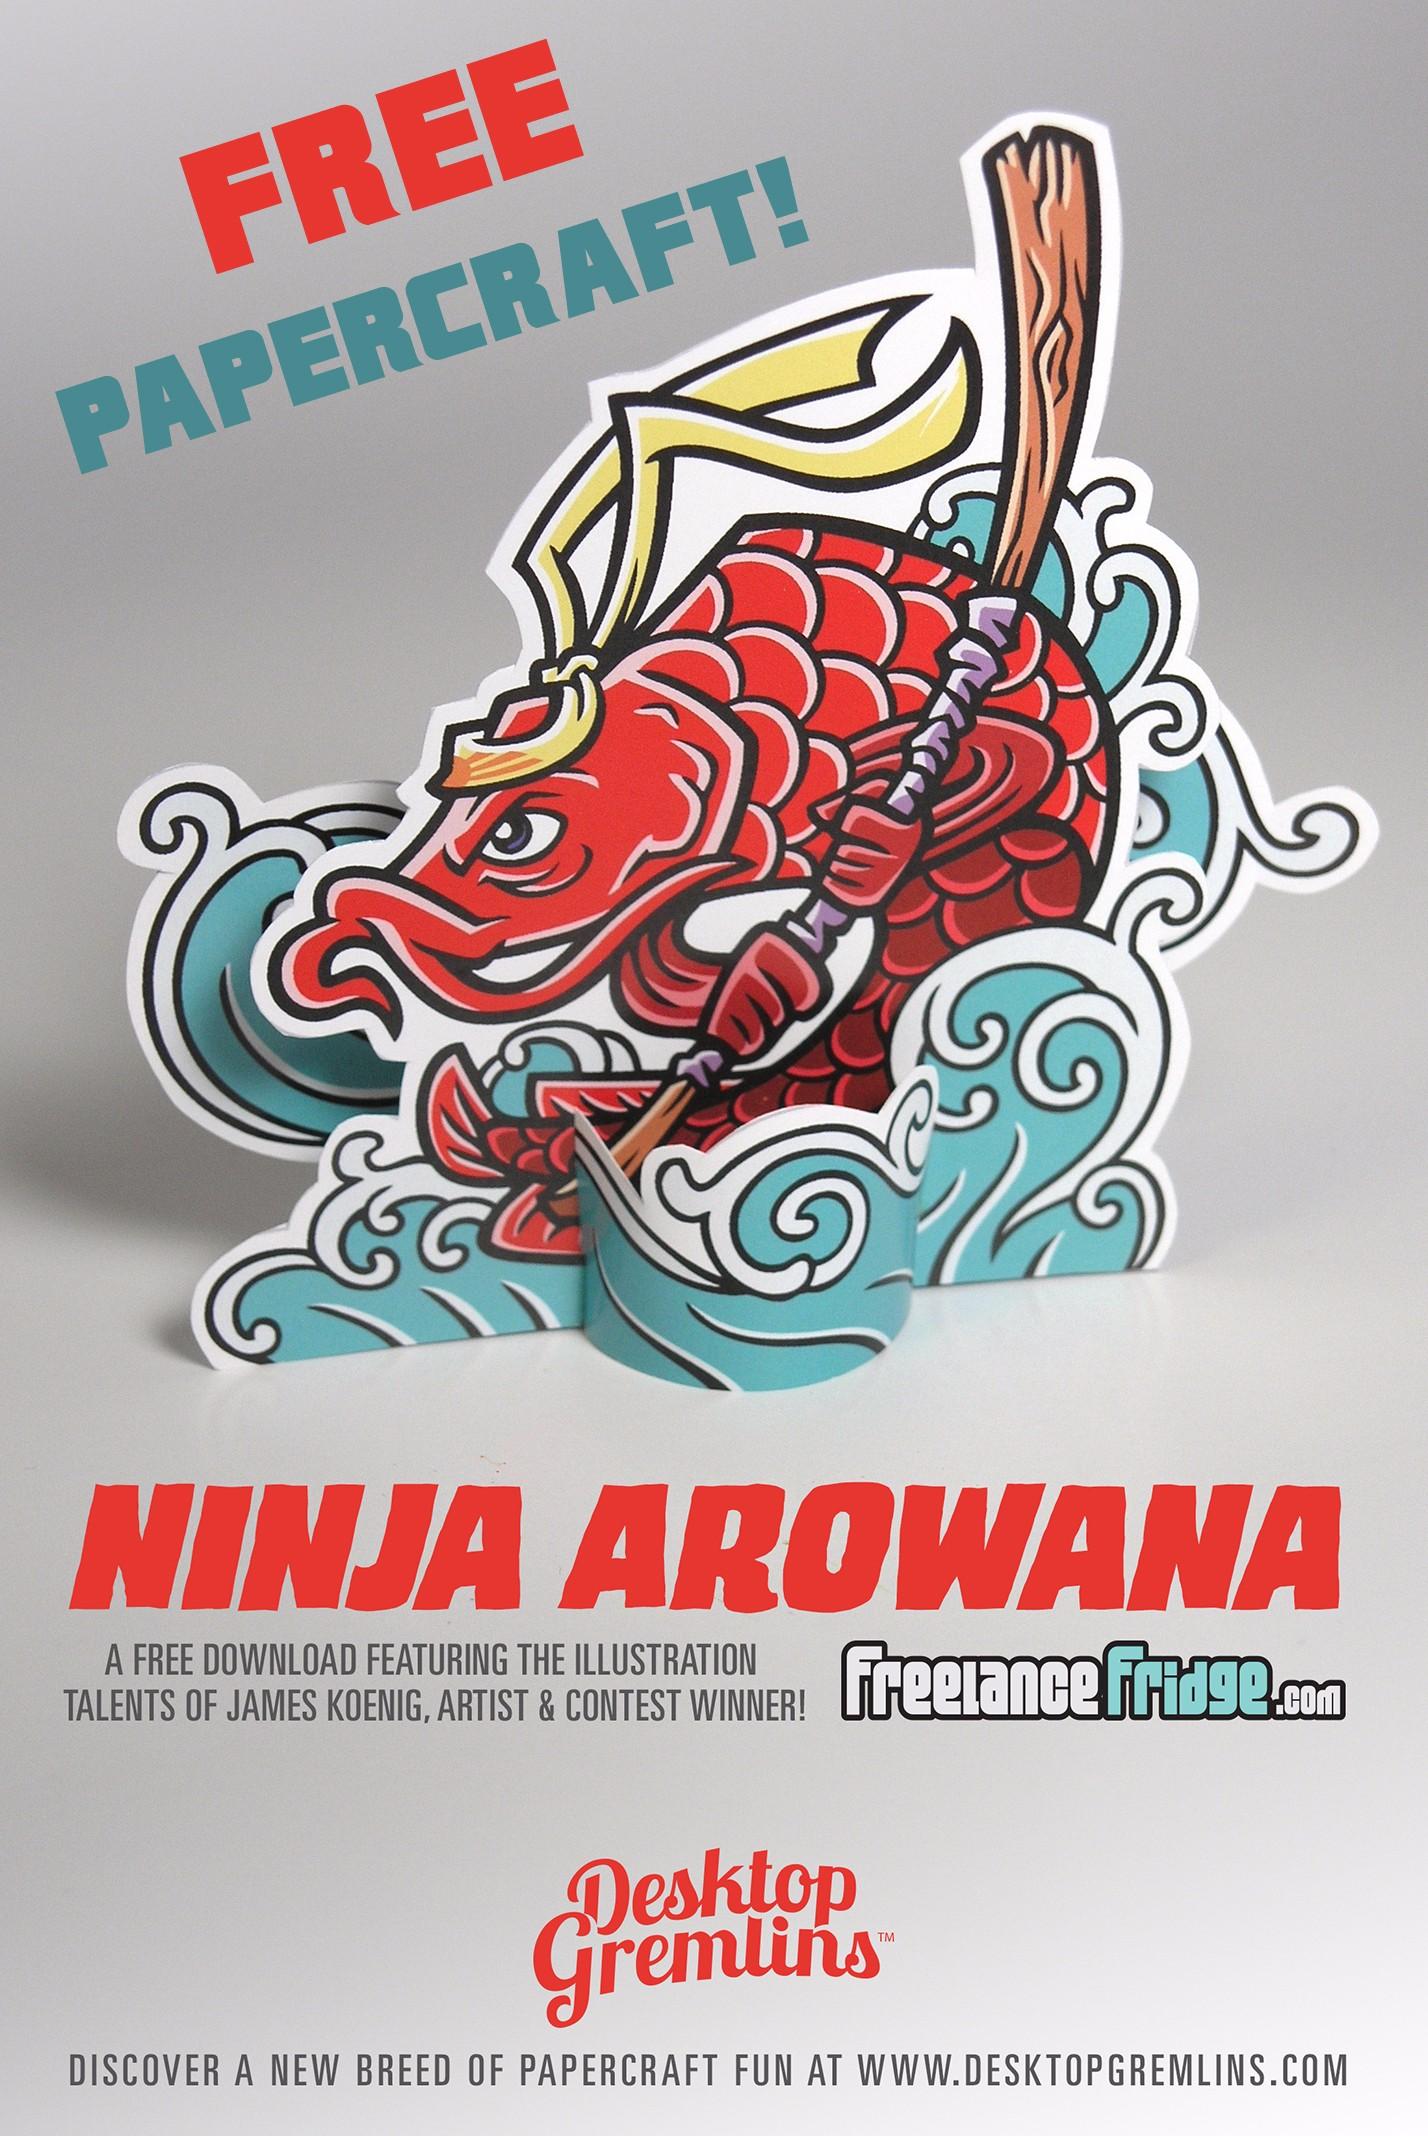 Desktop Gremlins and Freelance Fridge Free Papercraft hero Red Ninja Arowana Fish Paper Cuttable Cutout No Glue Craft